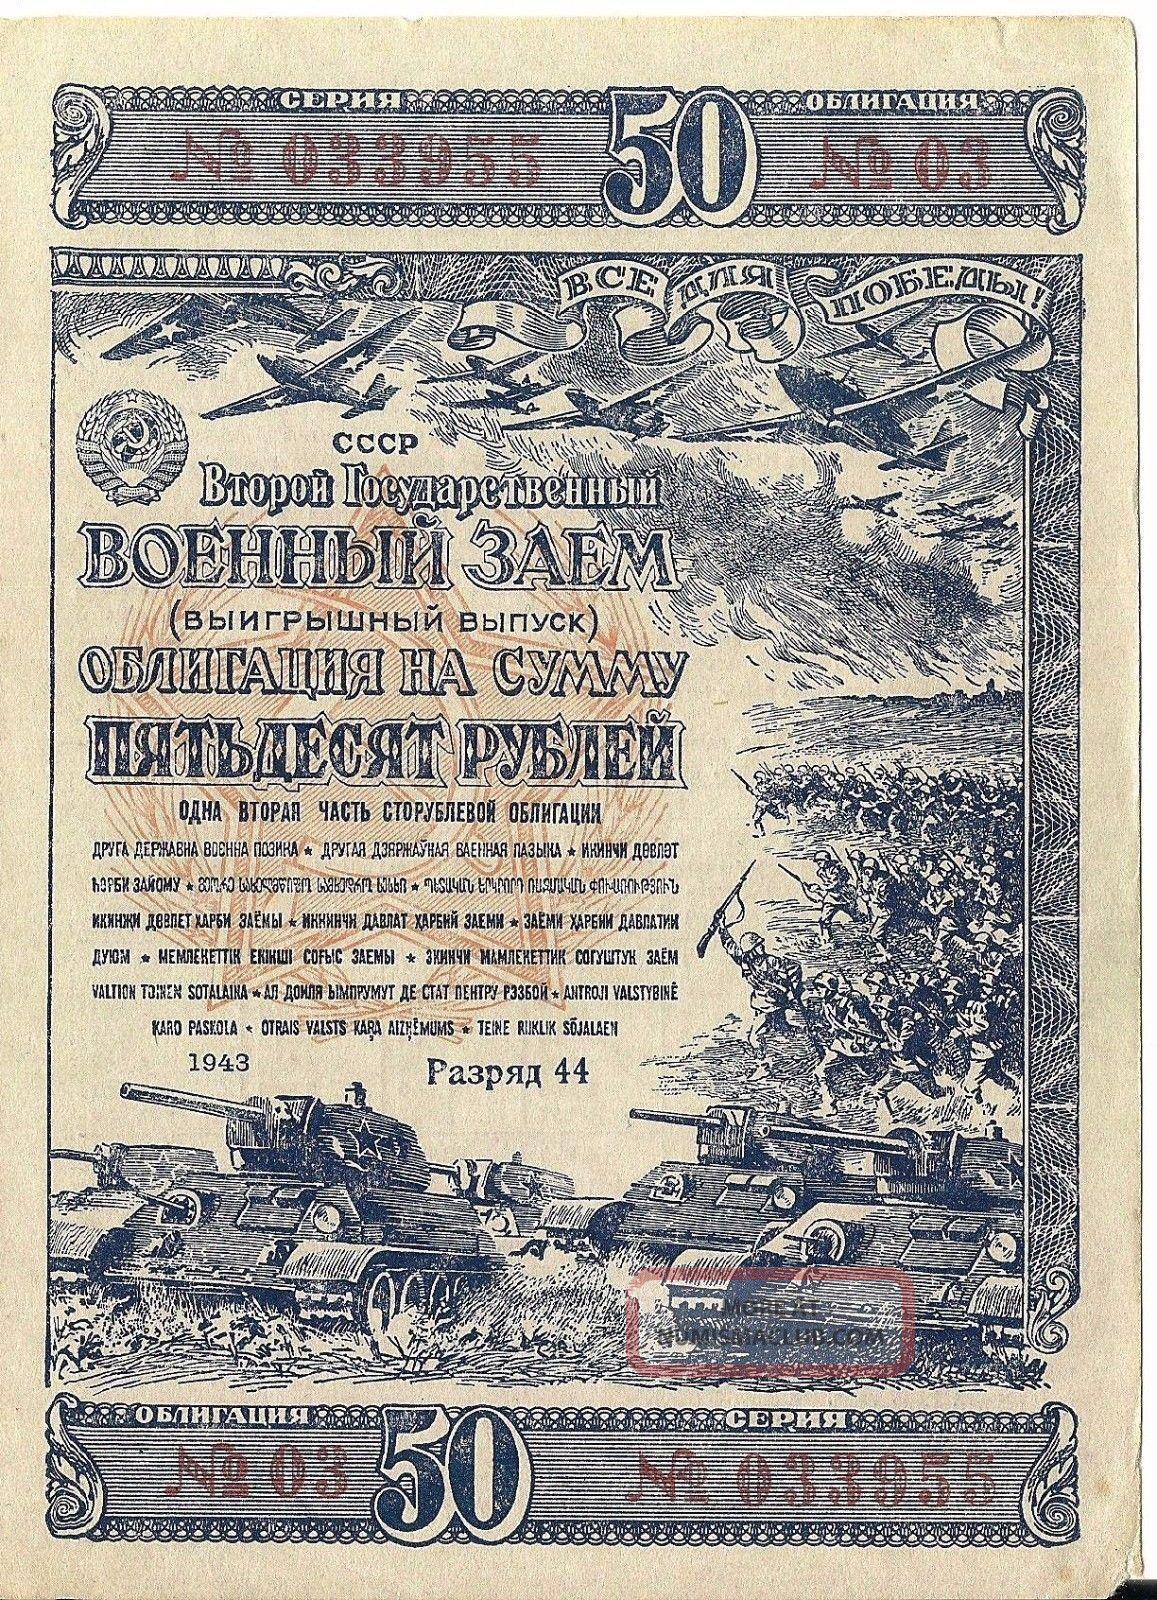 From Soviet Era 2 Different Denominations Russian Military War State Loan,  1943 Stocks & Bonds, Scripophily photo